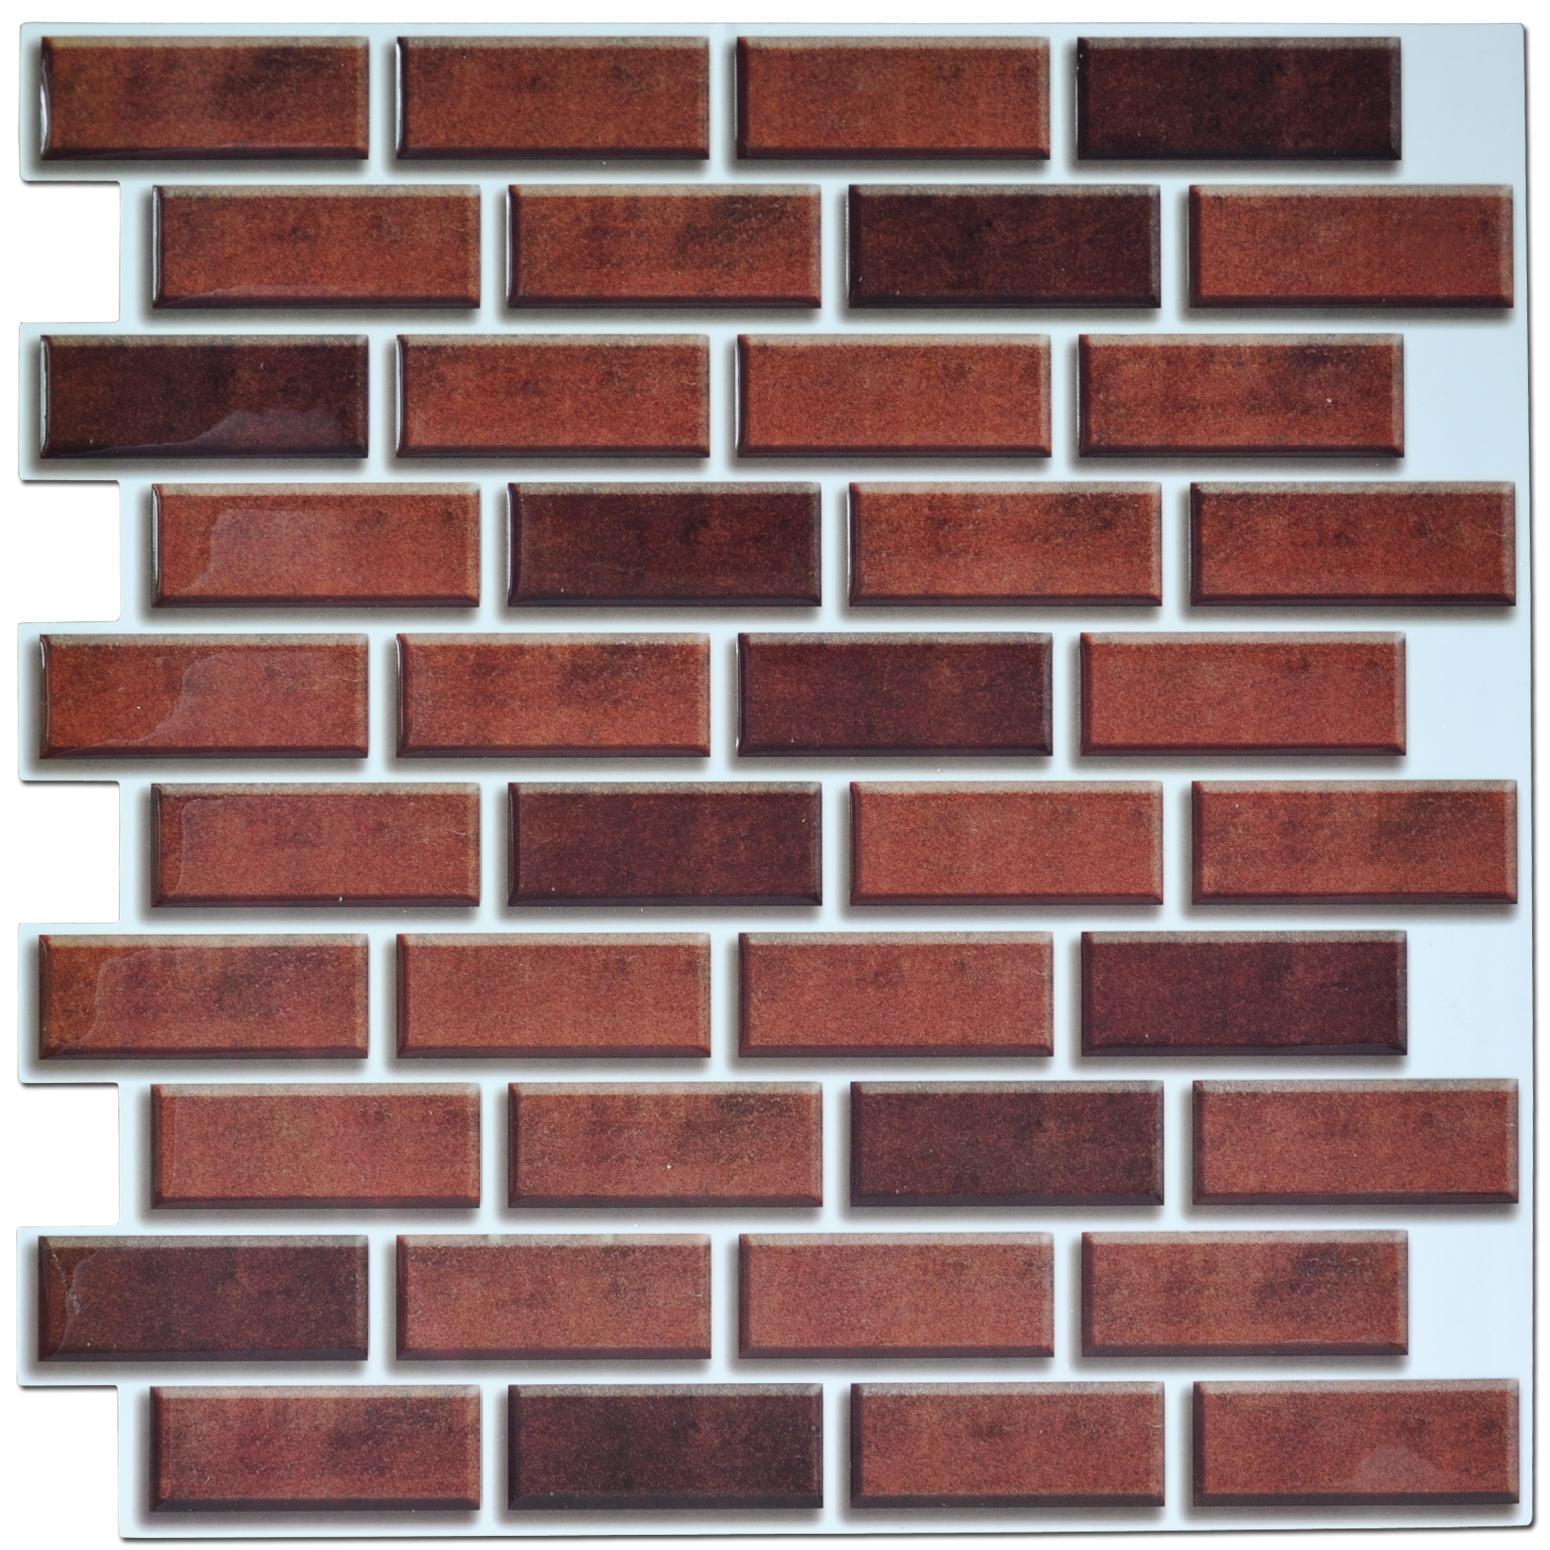 Peel and stick brick backsplash tile for kitchen 12 x12 for Peel and stick tile